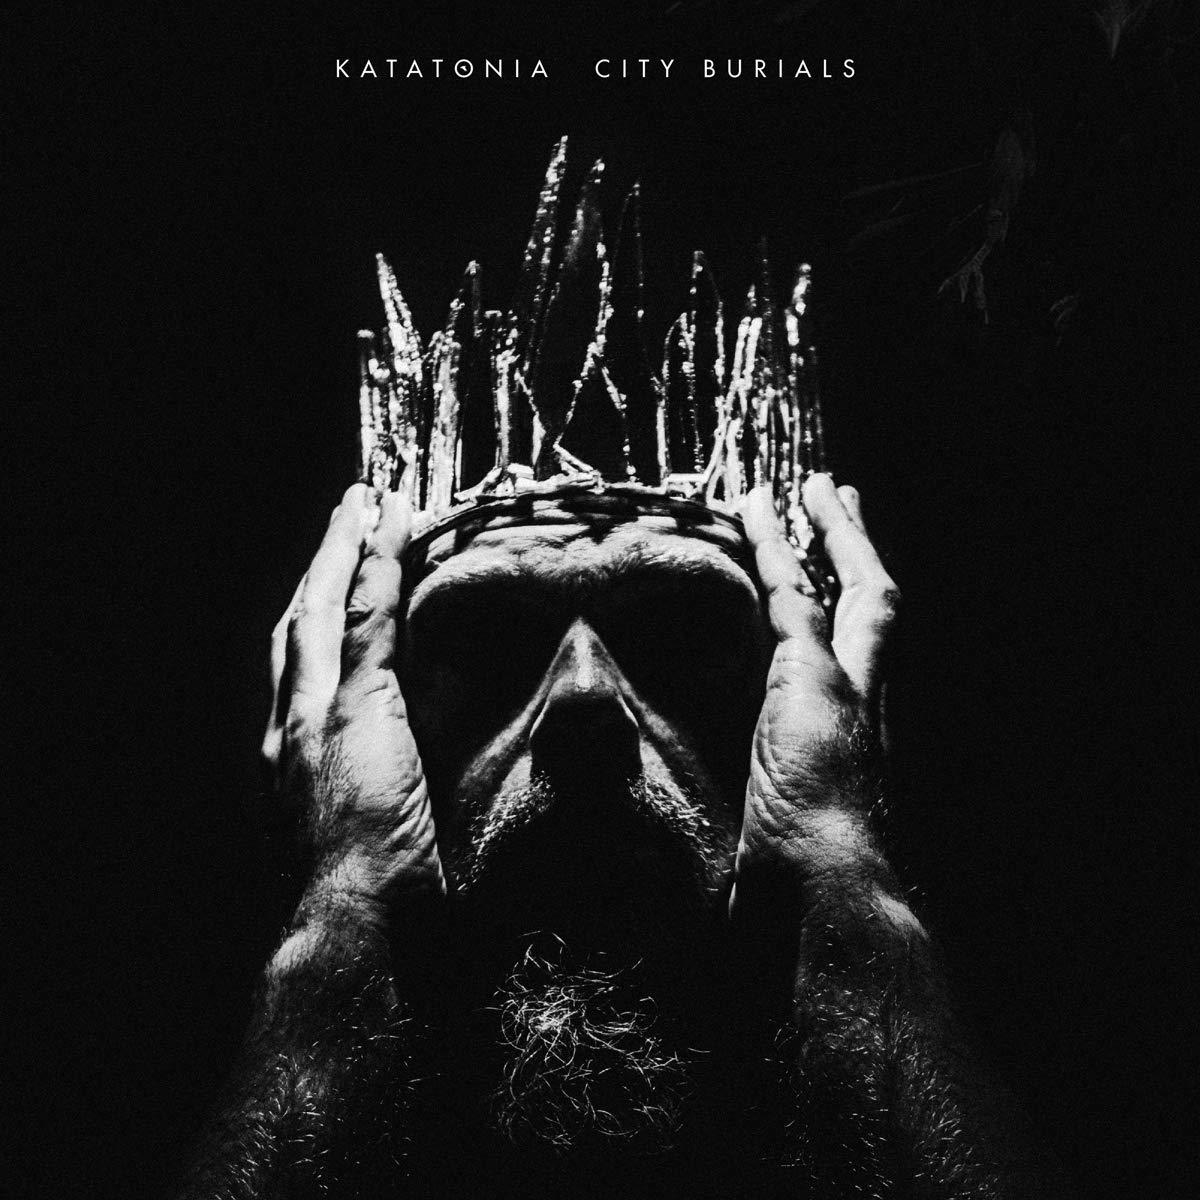 Katatonia: City Burials (2020) Book Cover